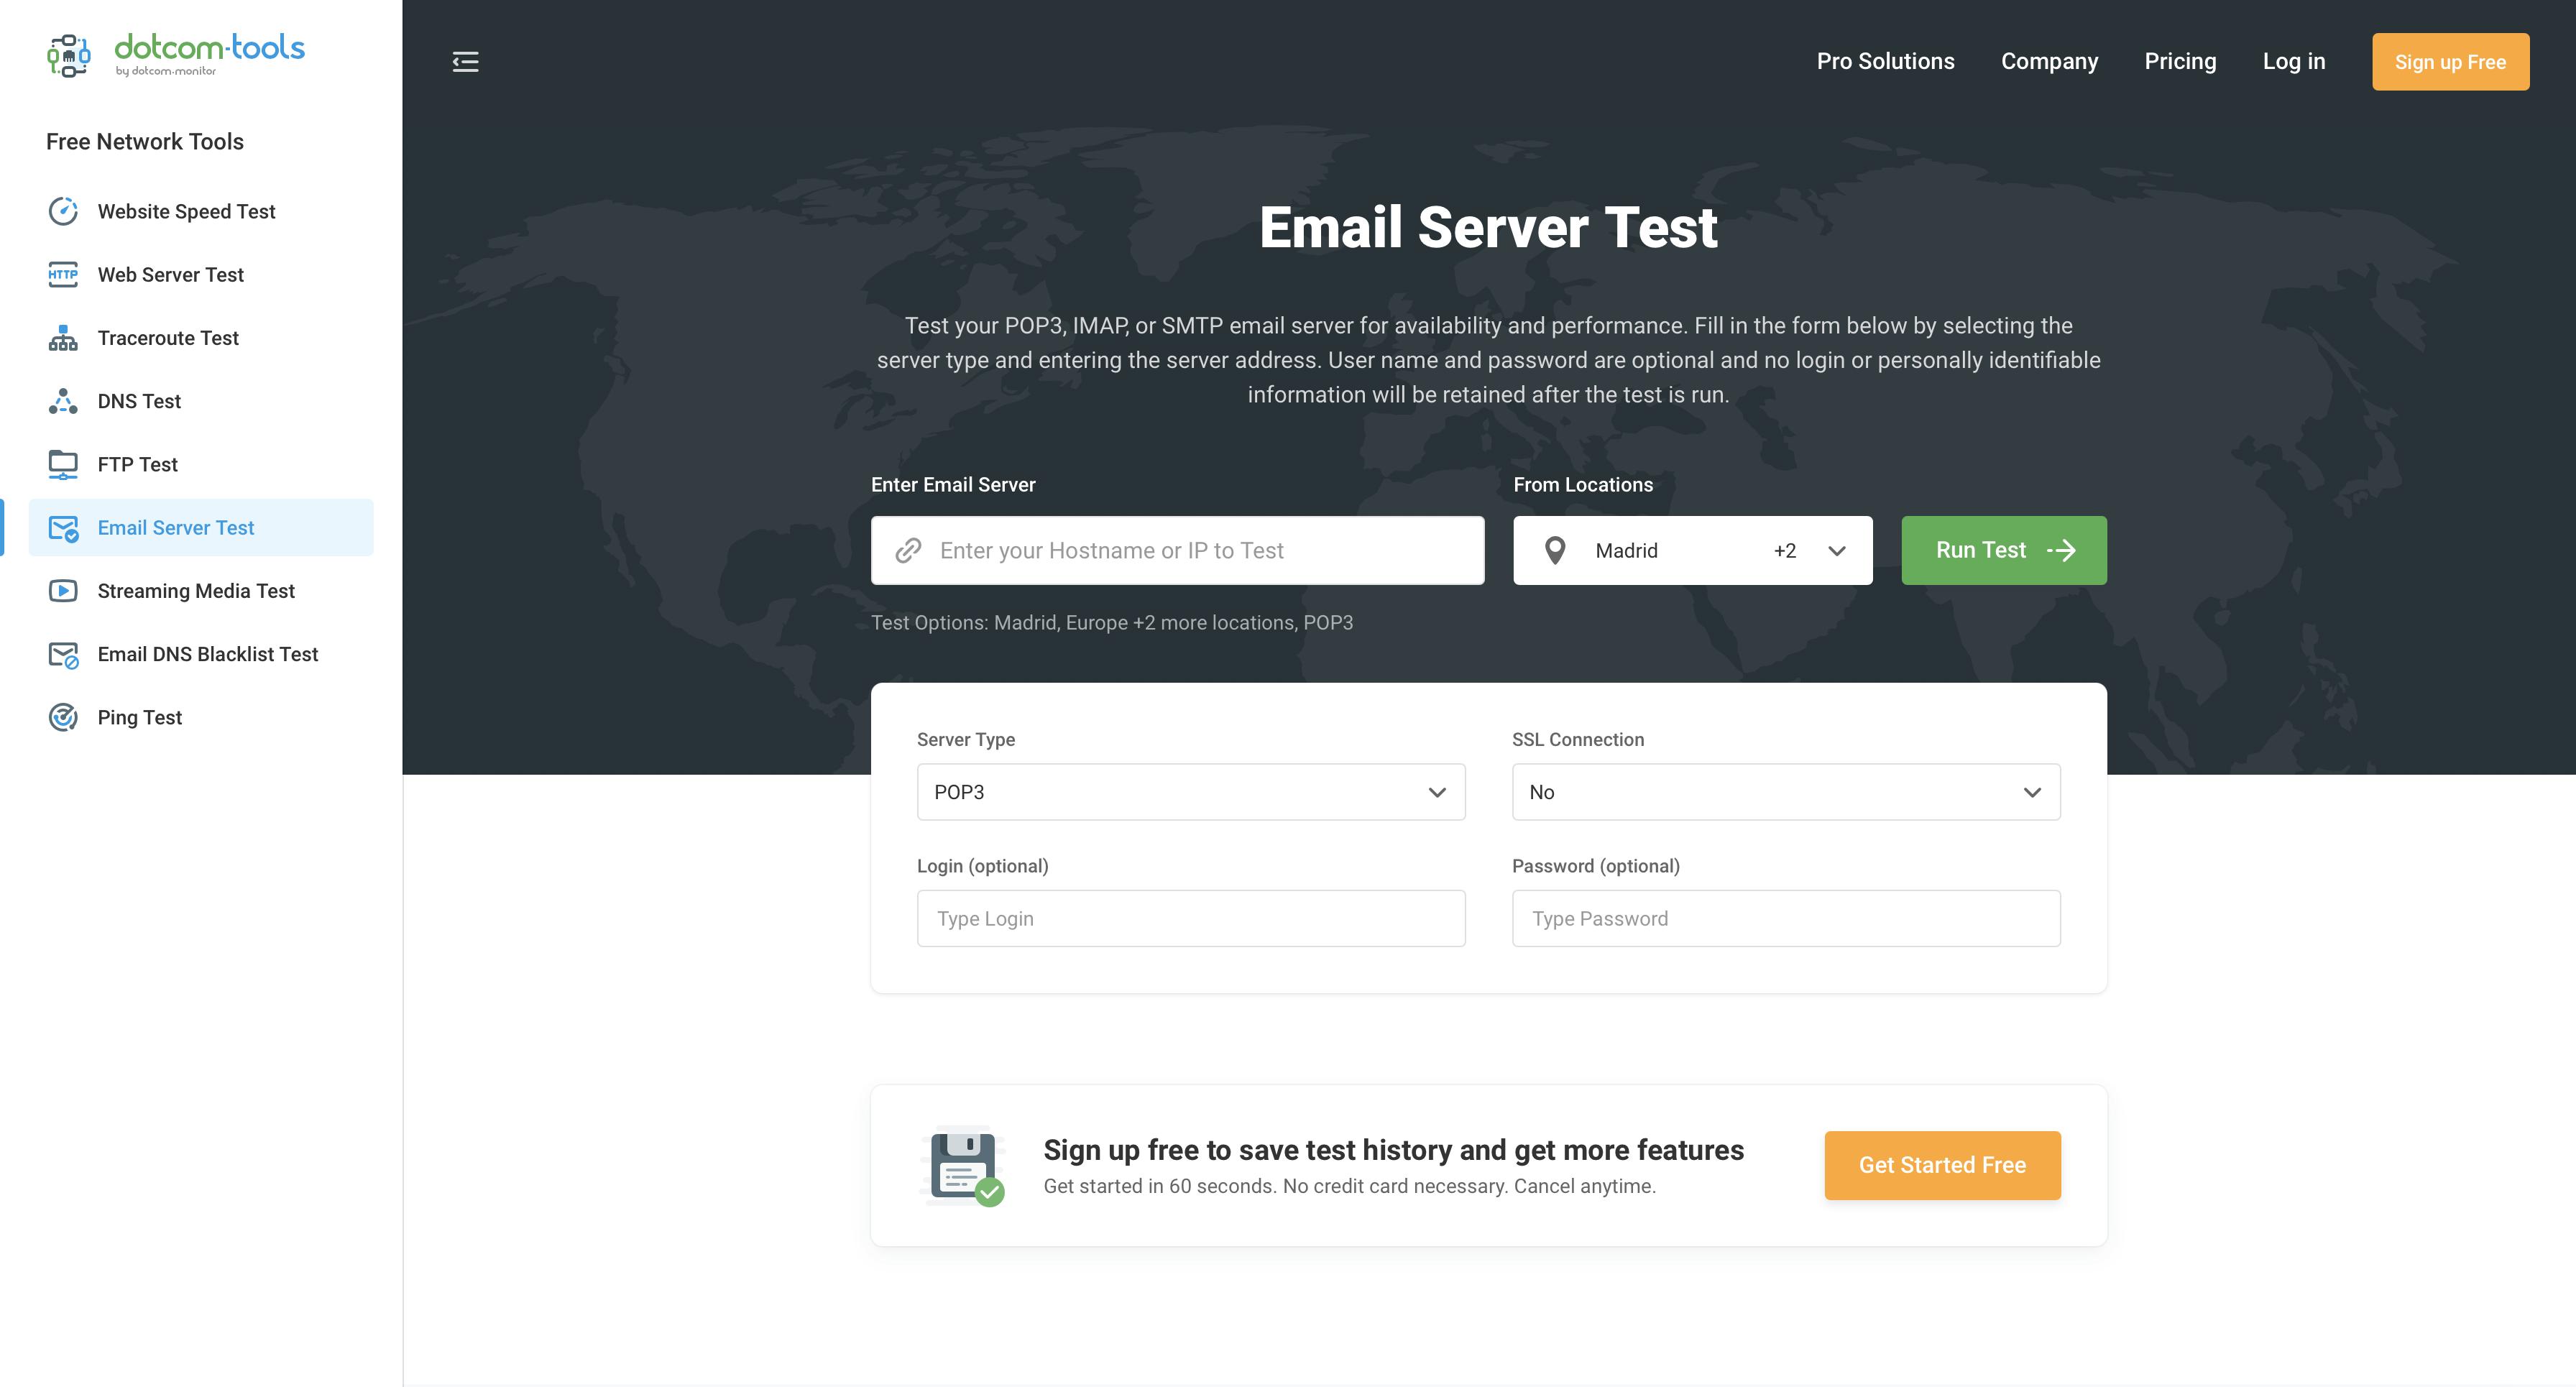 Email Server Test